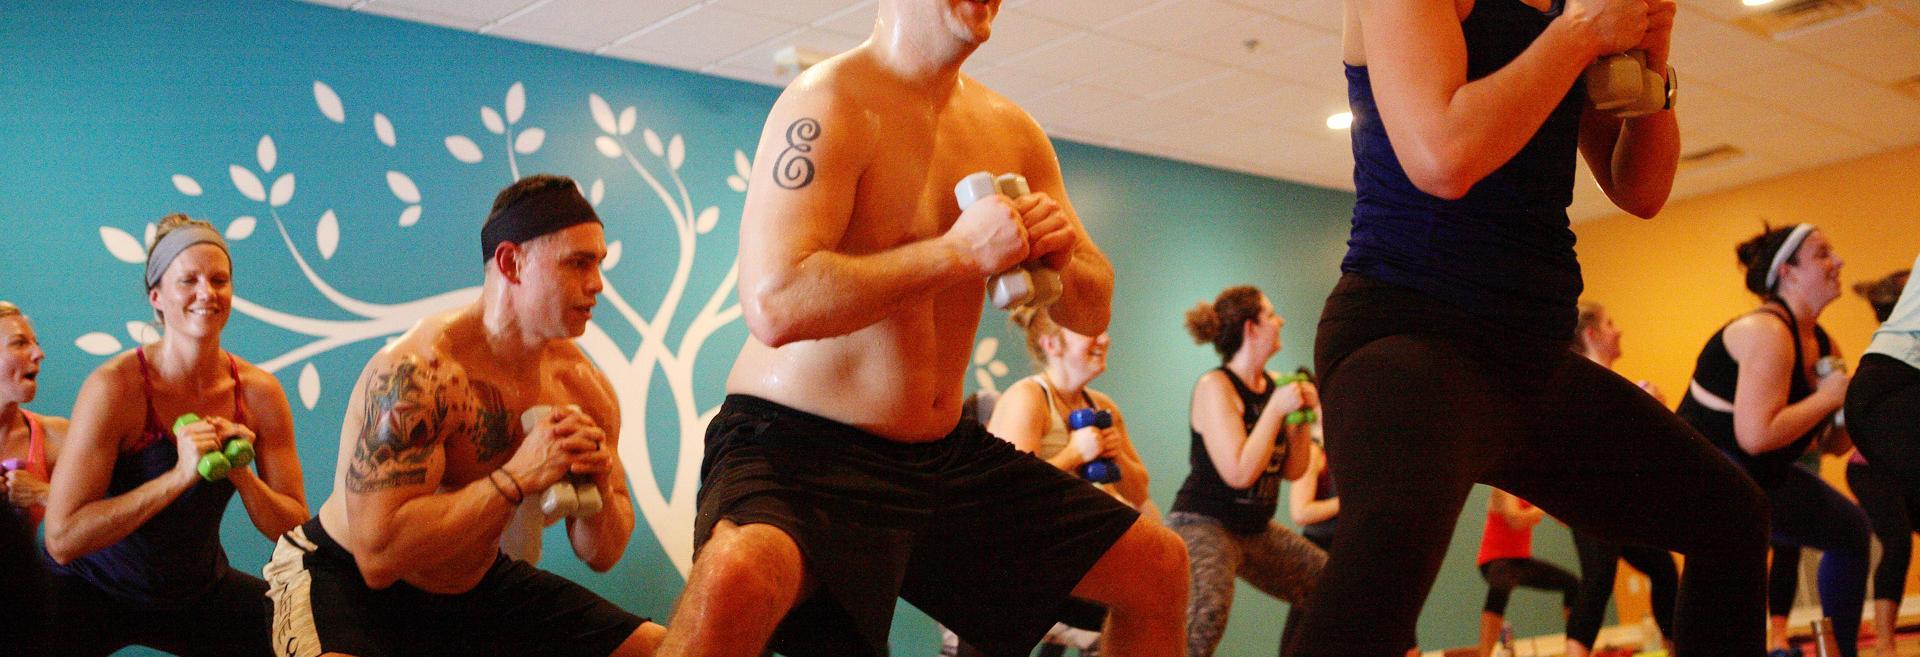 yoga class at twisted hot yoga studio